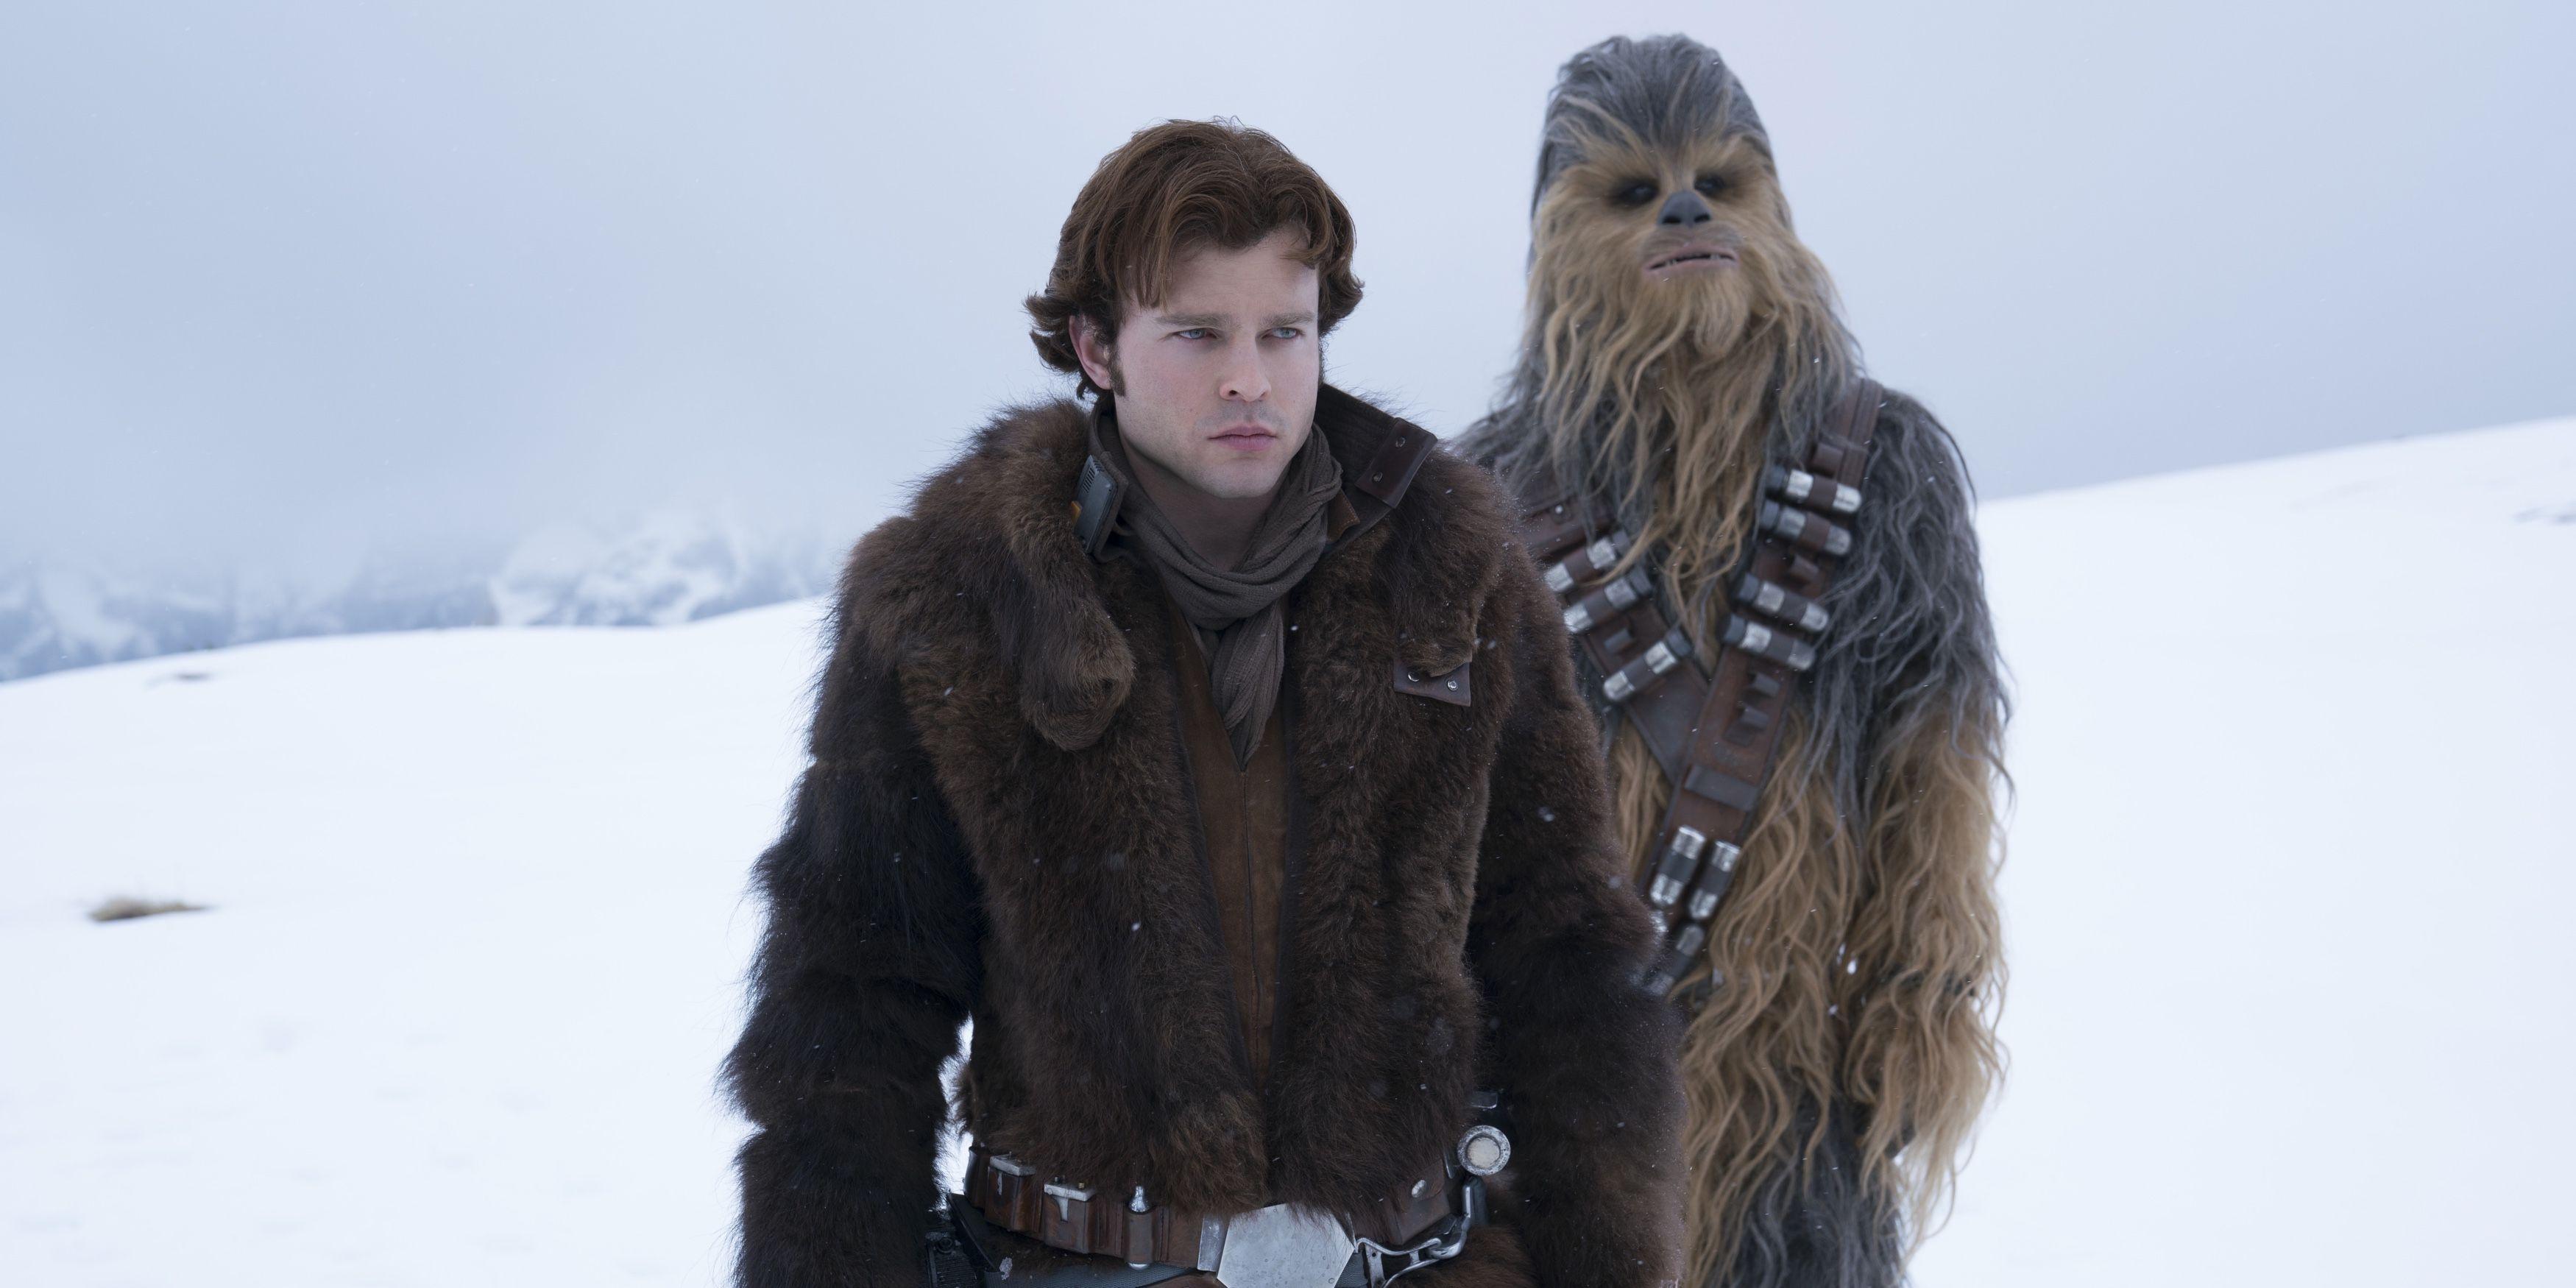 Solo: Solo: A Star Wars Story Has Massive 77 Percent Box Office Drop